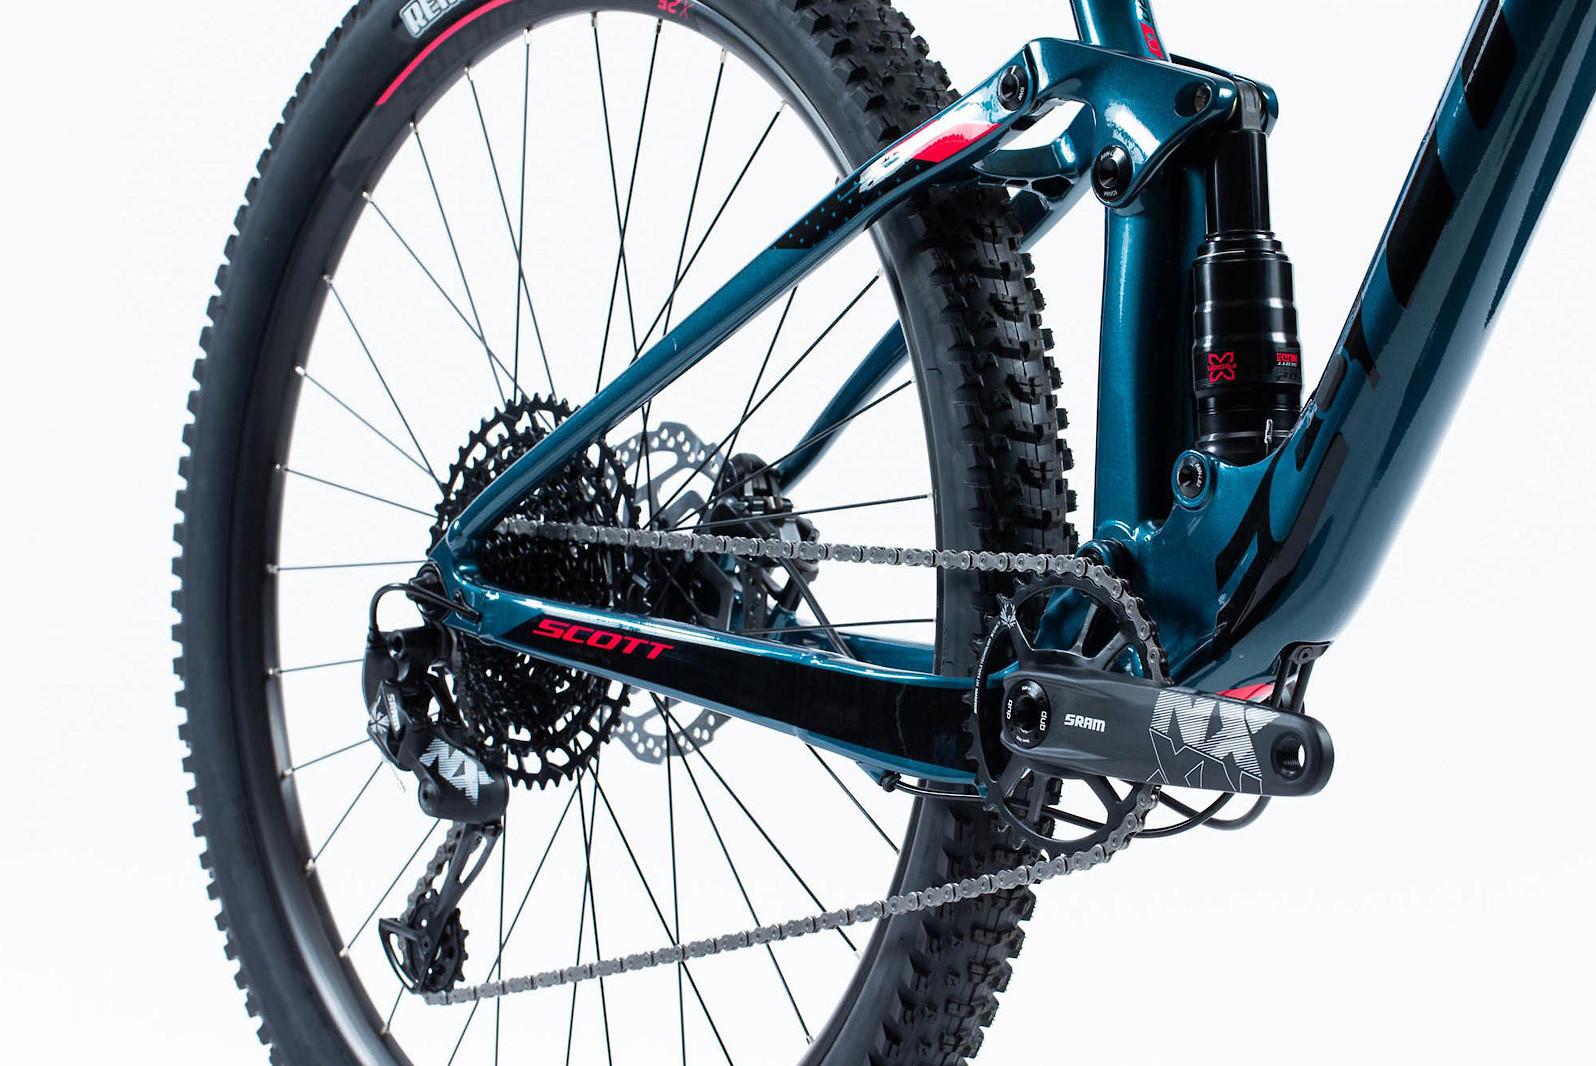 79d64ac7395 2019 Scott Spark 930 Contessa Bike - Reviews, Comparisons, Specs ...